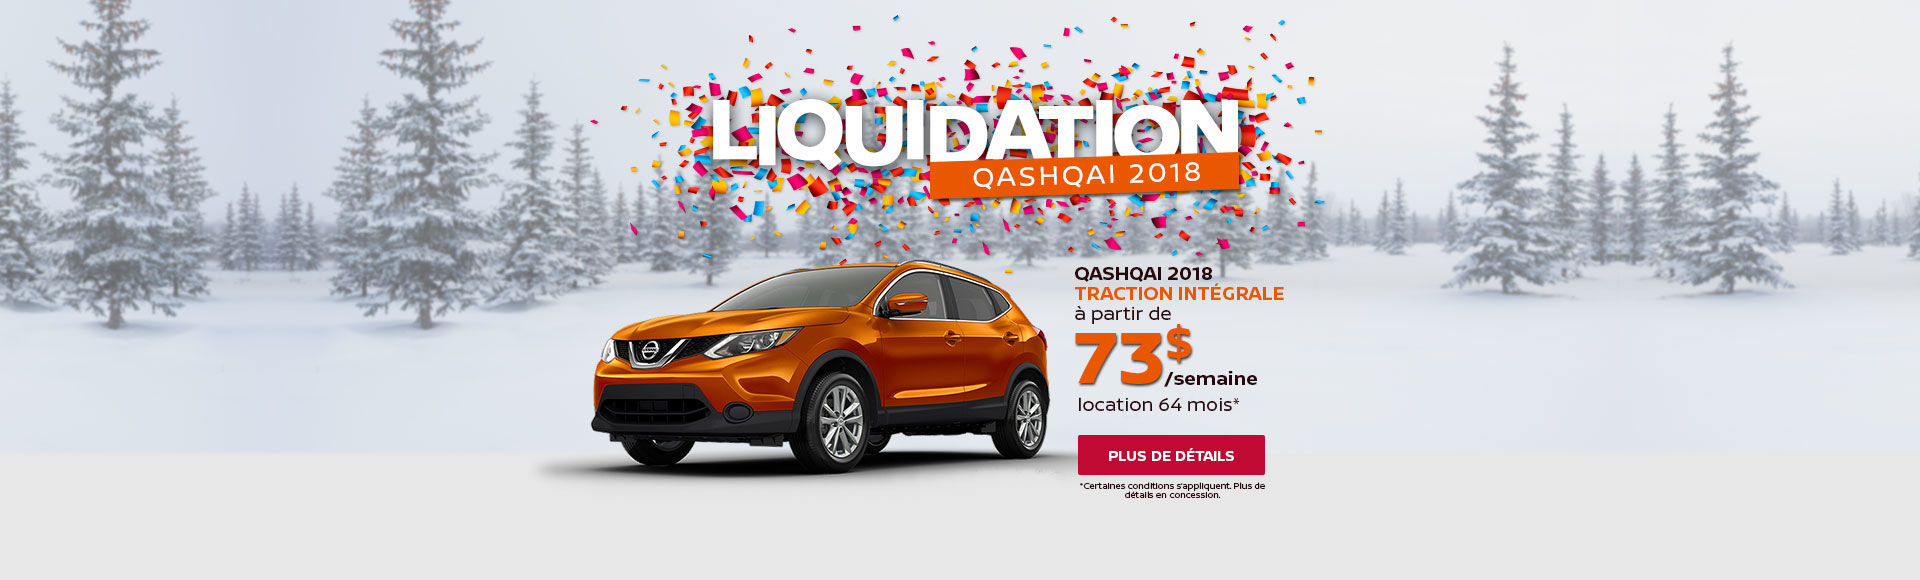 Liquidation Qashqai 2018